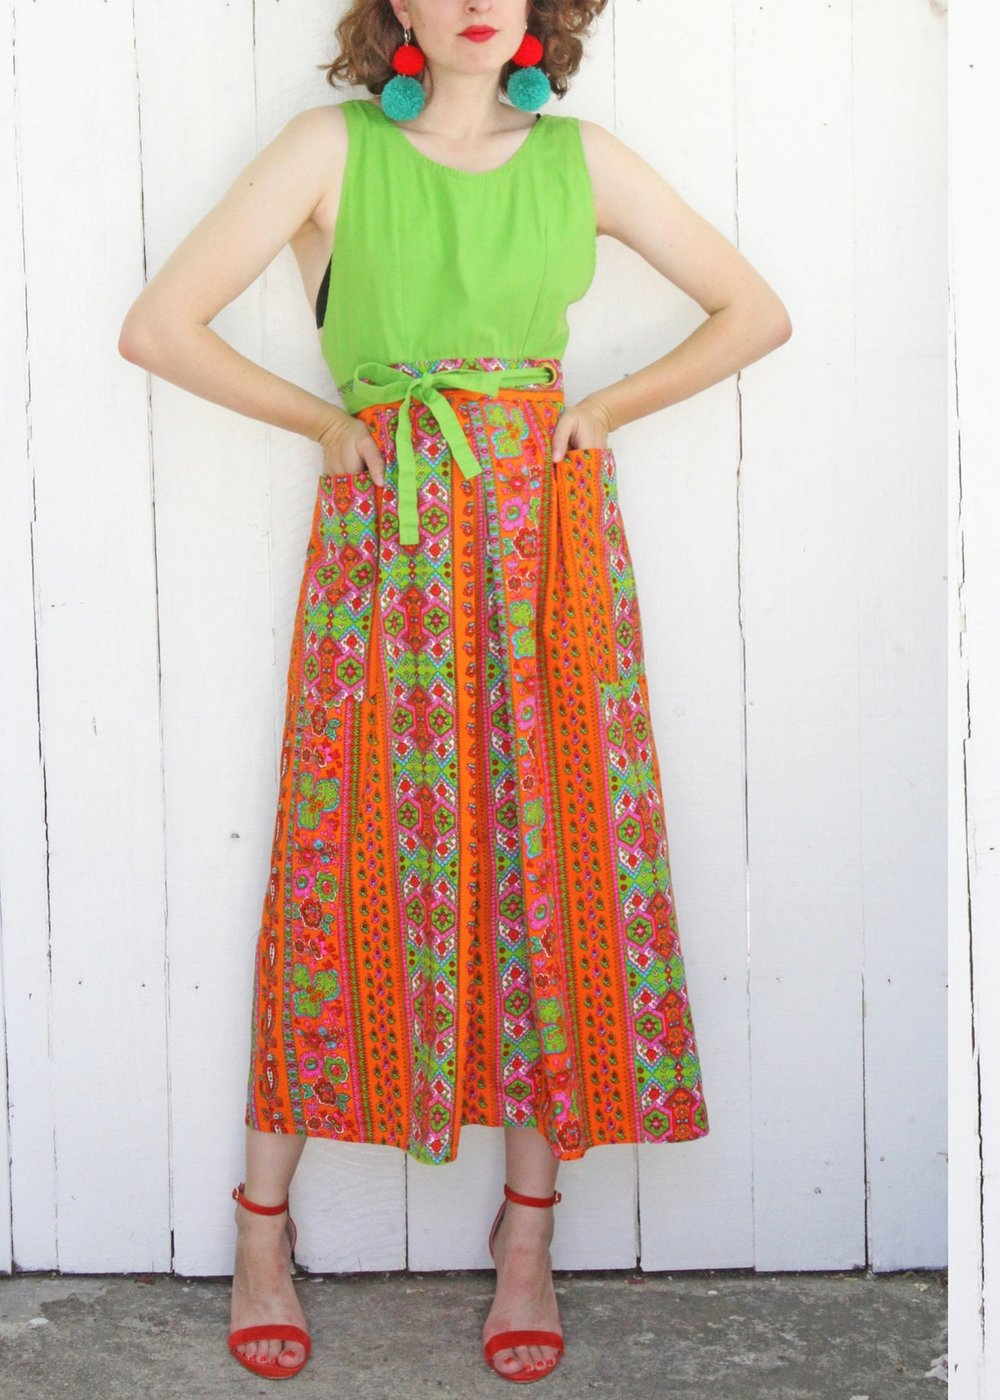 1970sFolk PrintCottonApron Dress - From COAST to COAST VINTAGE